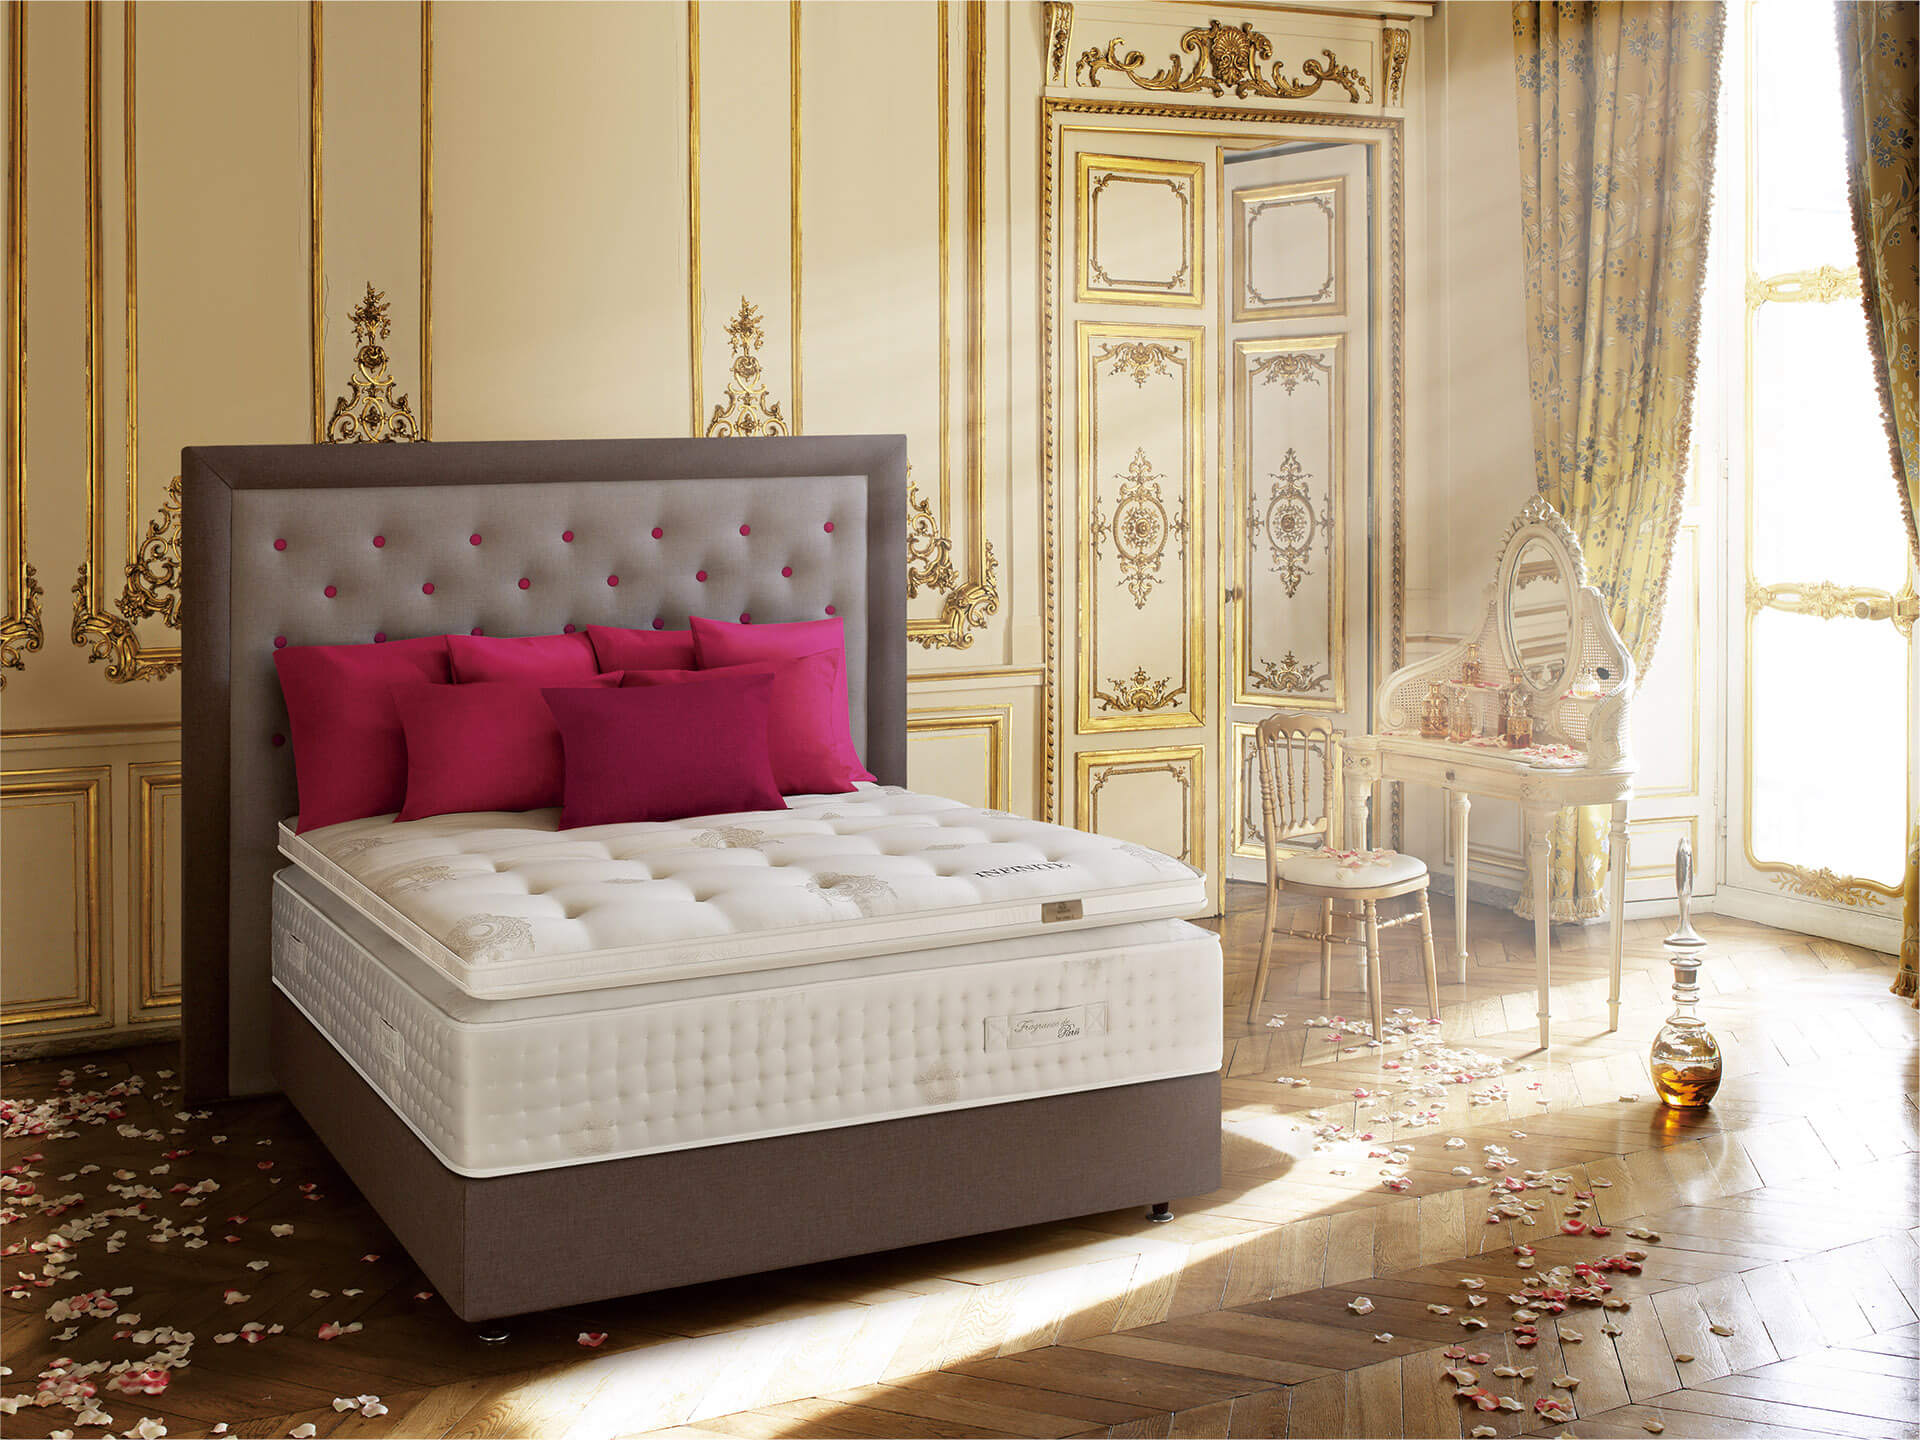 TRECA PARIS 法國精品床墊 漫步米蘭